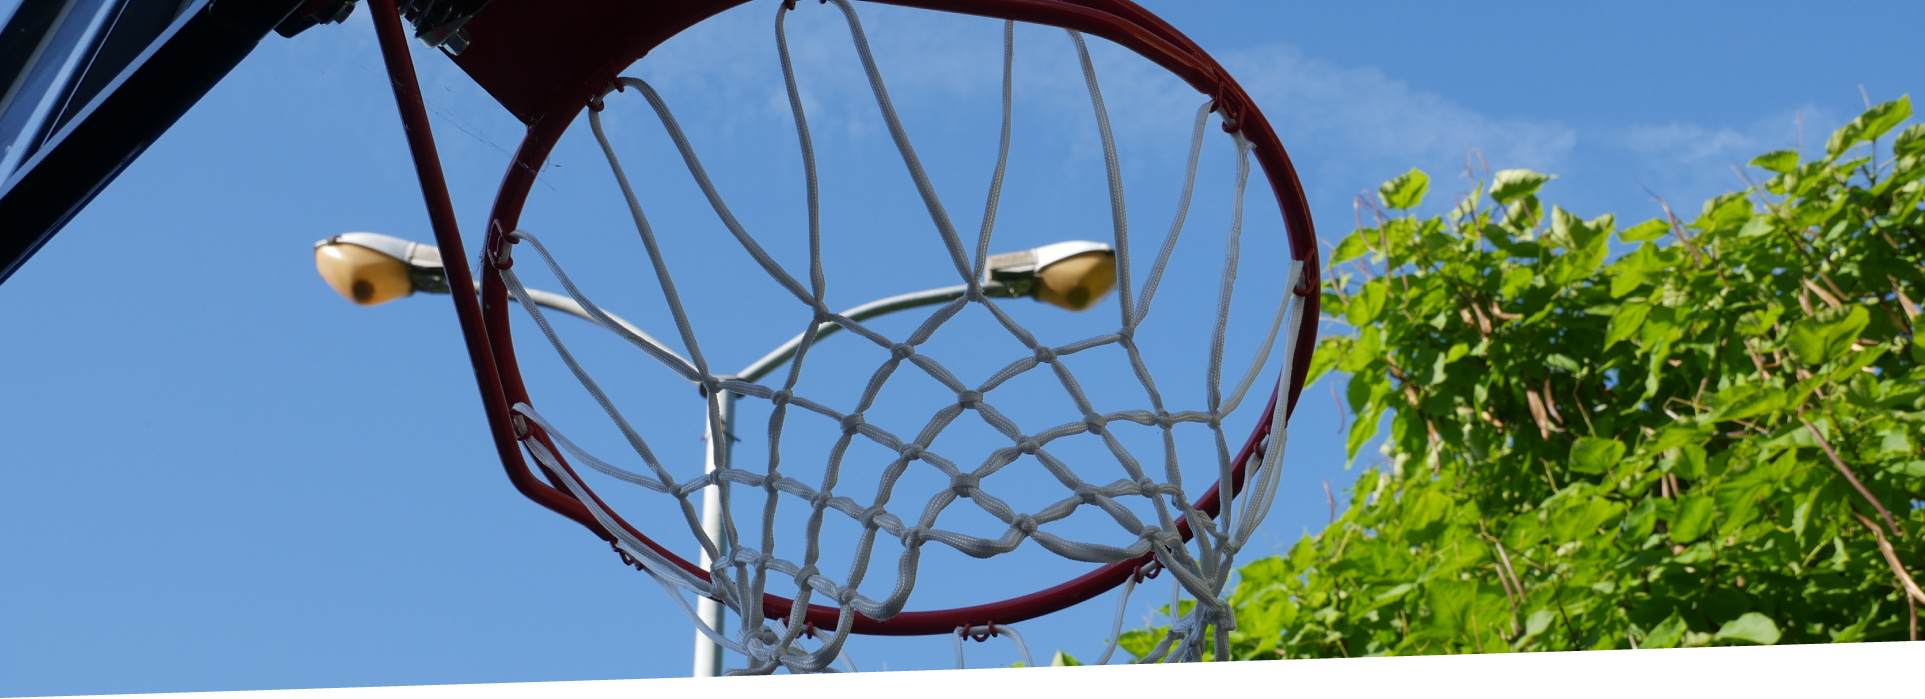 Basketballkorb mit Straßenlaterne